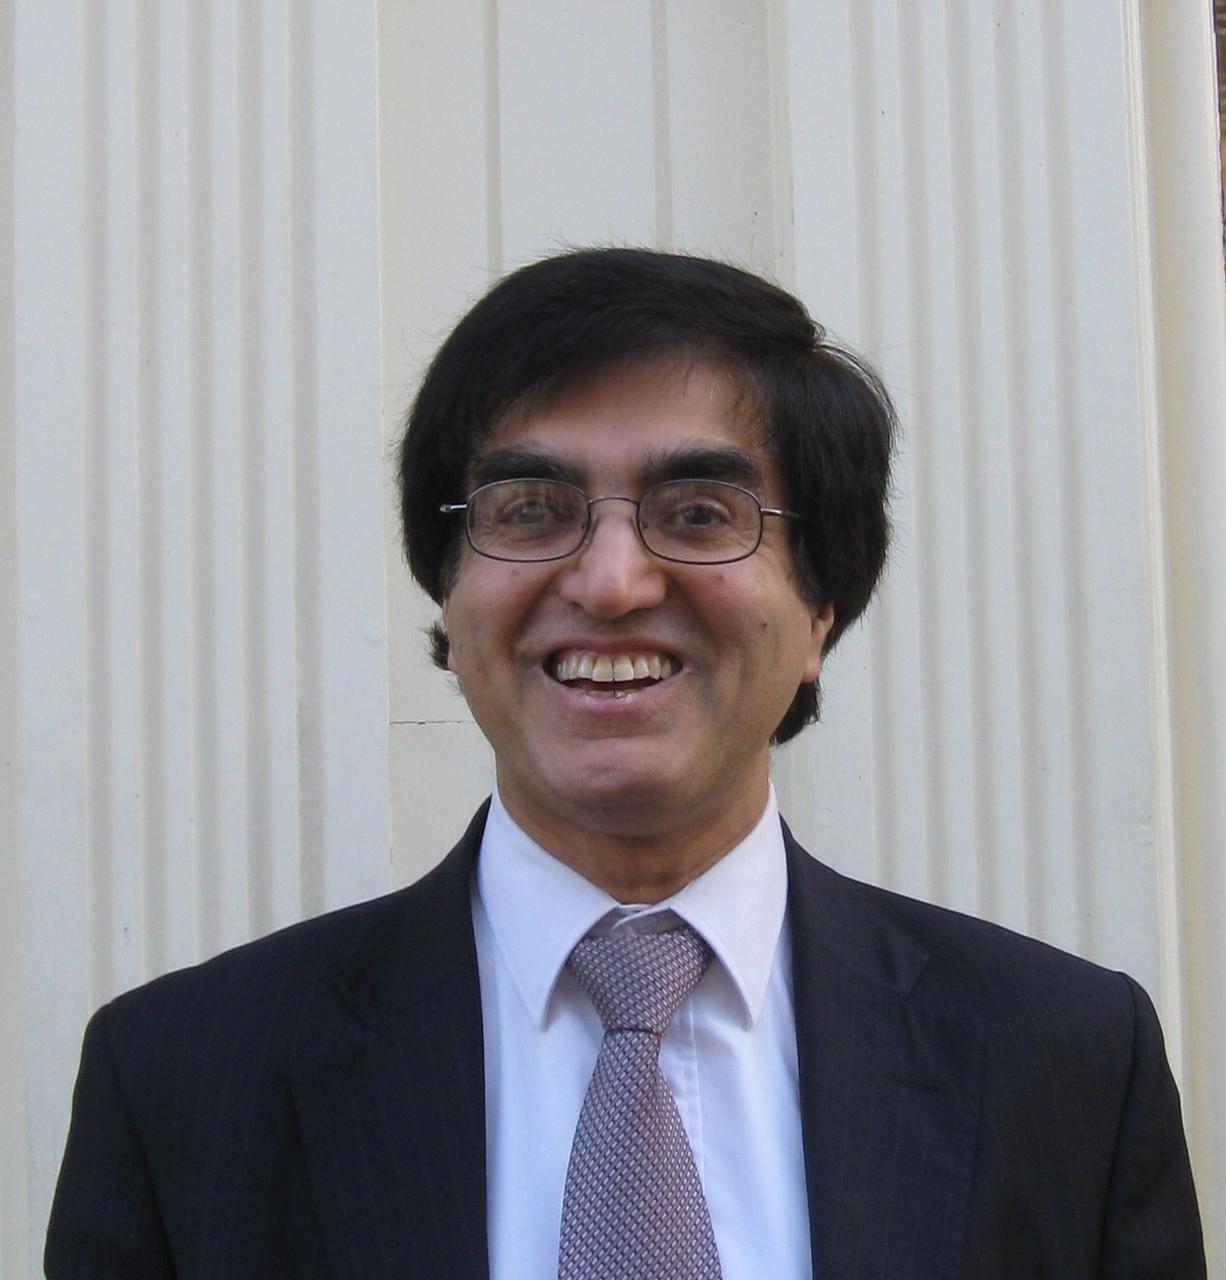 Mazhar Manzoor